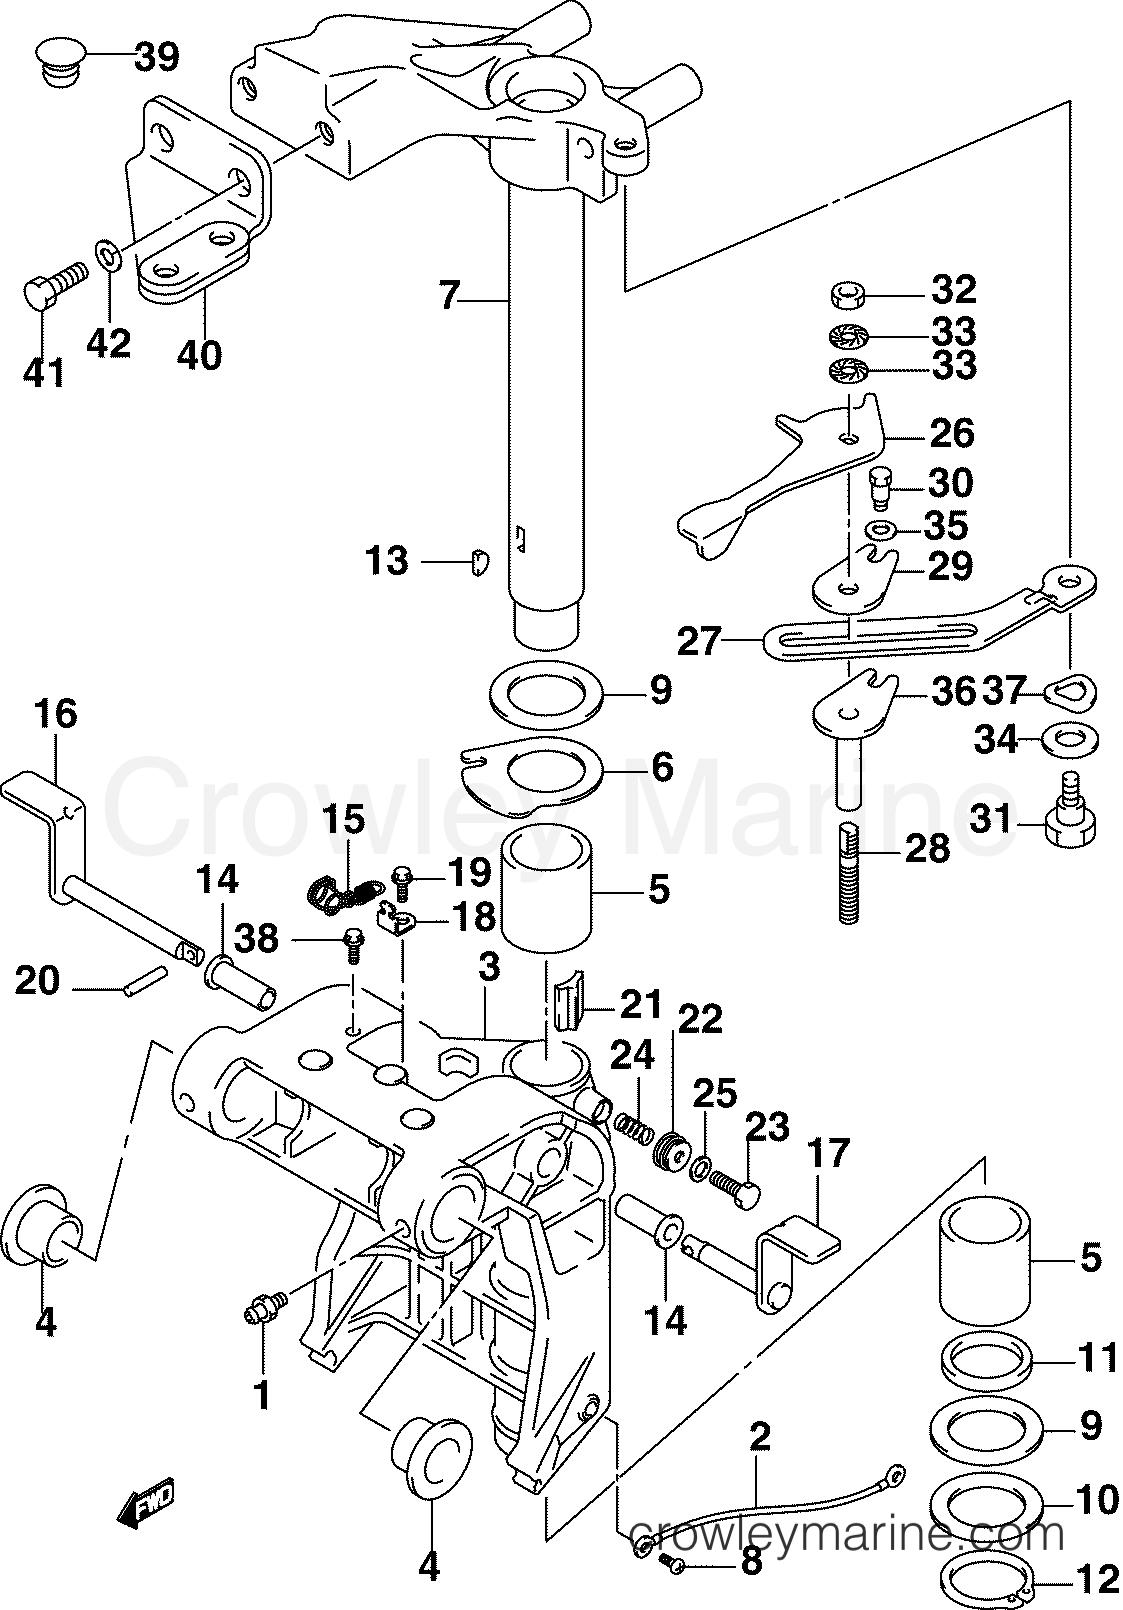 T56 Parts Diagram | Wiring Diagram Database